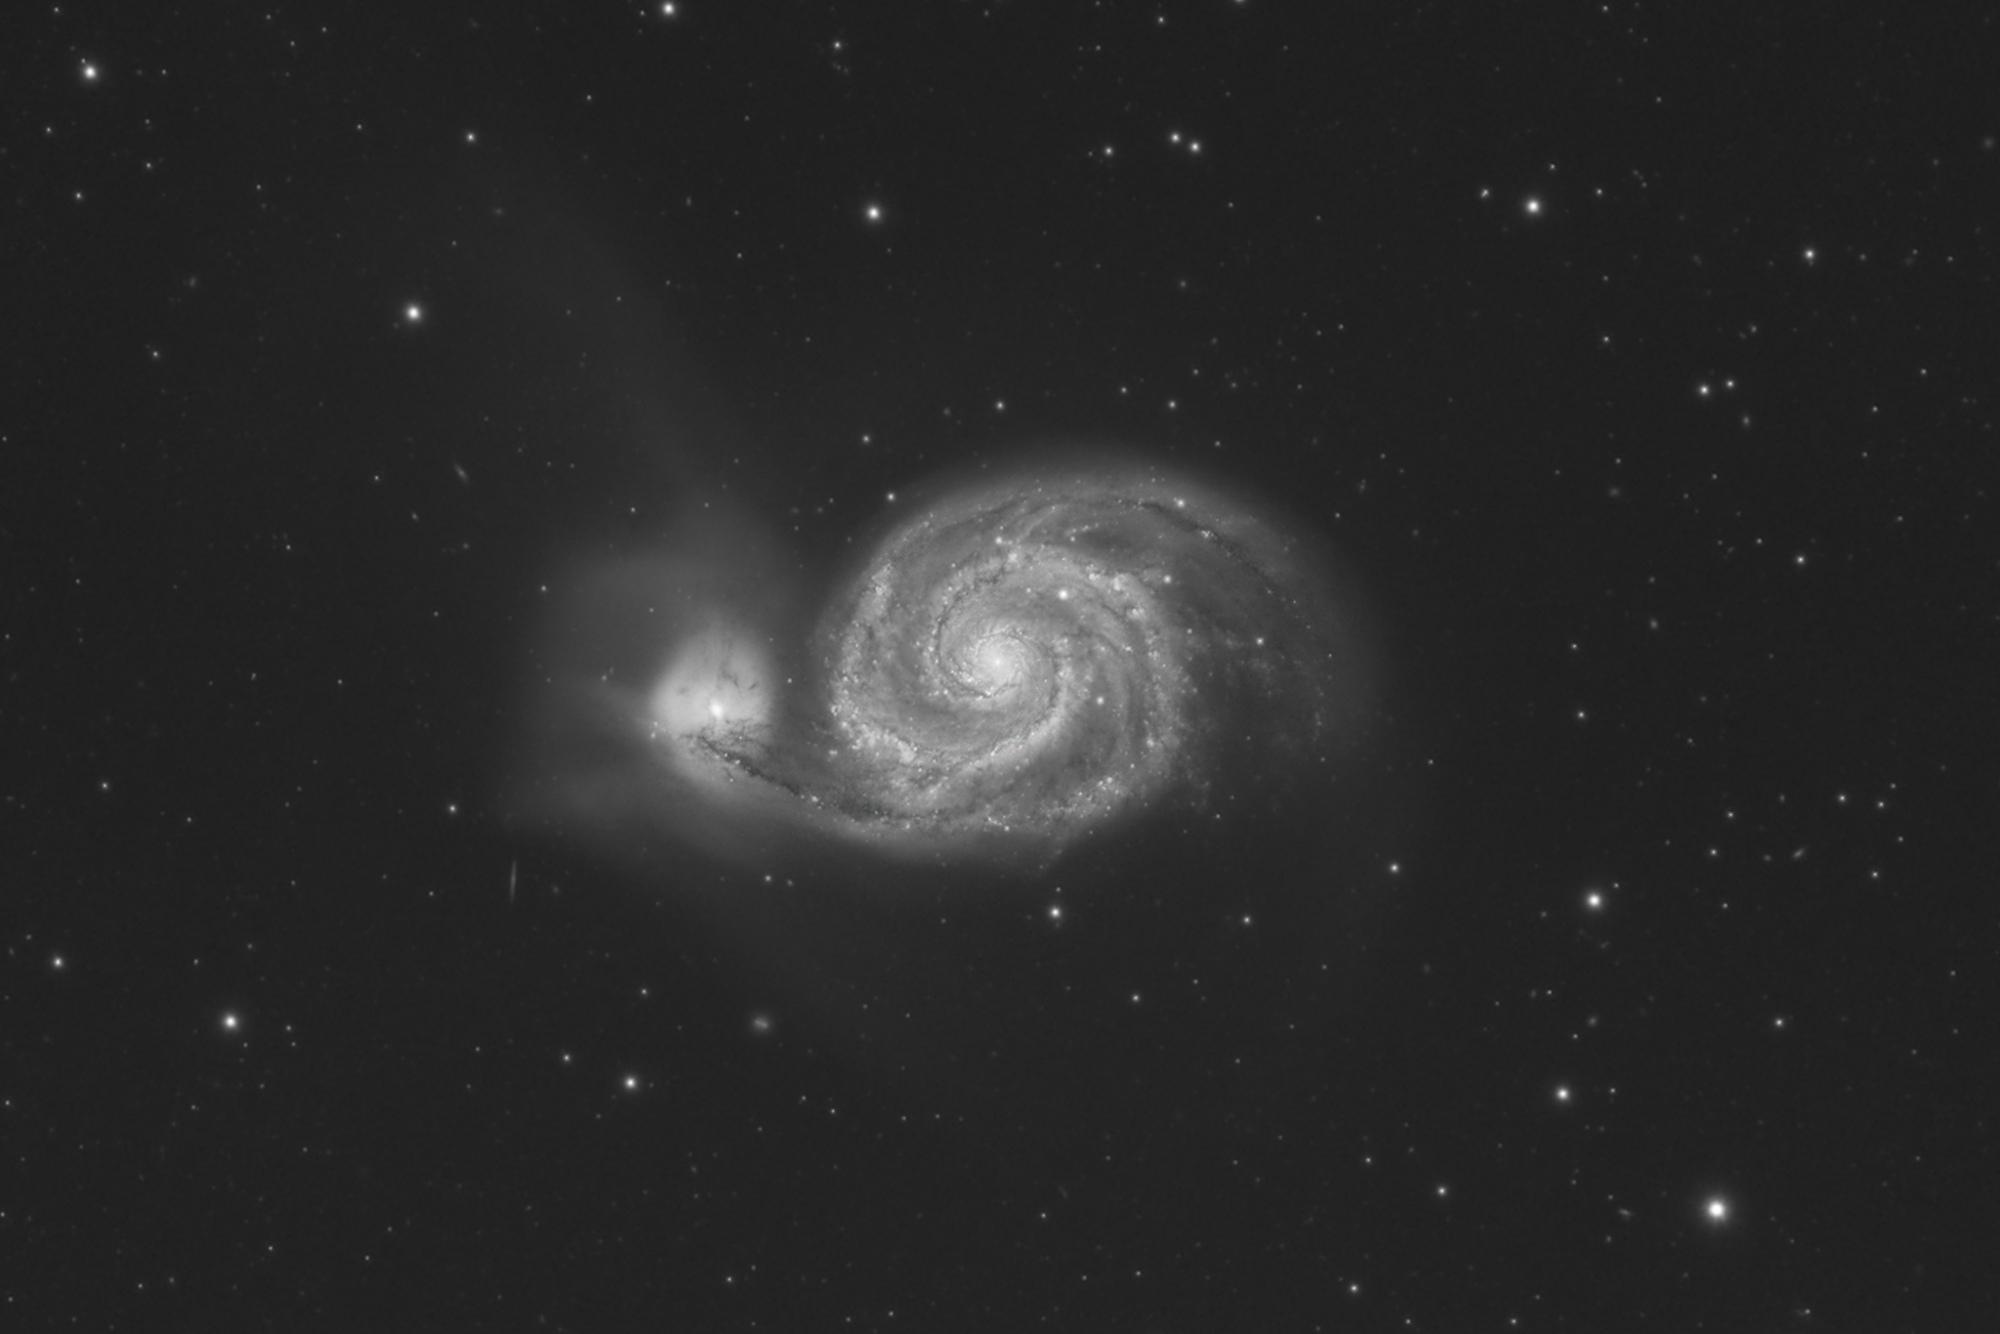 M51_L-2-topaz.jpg